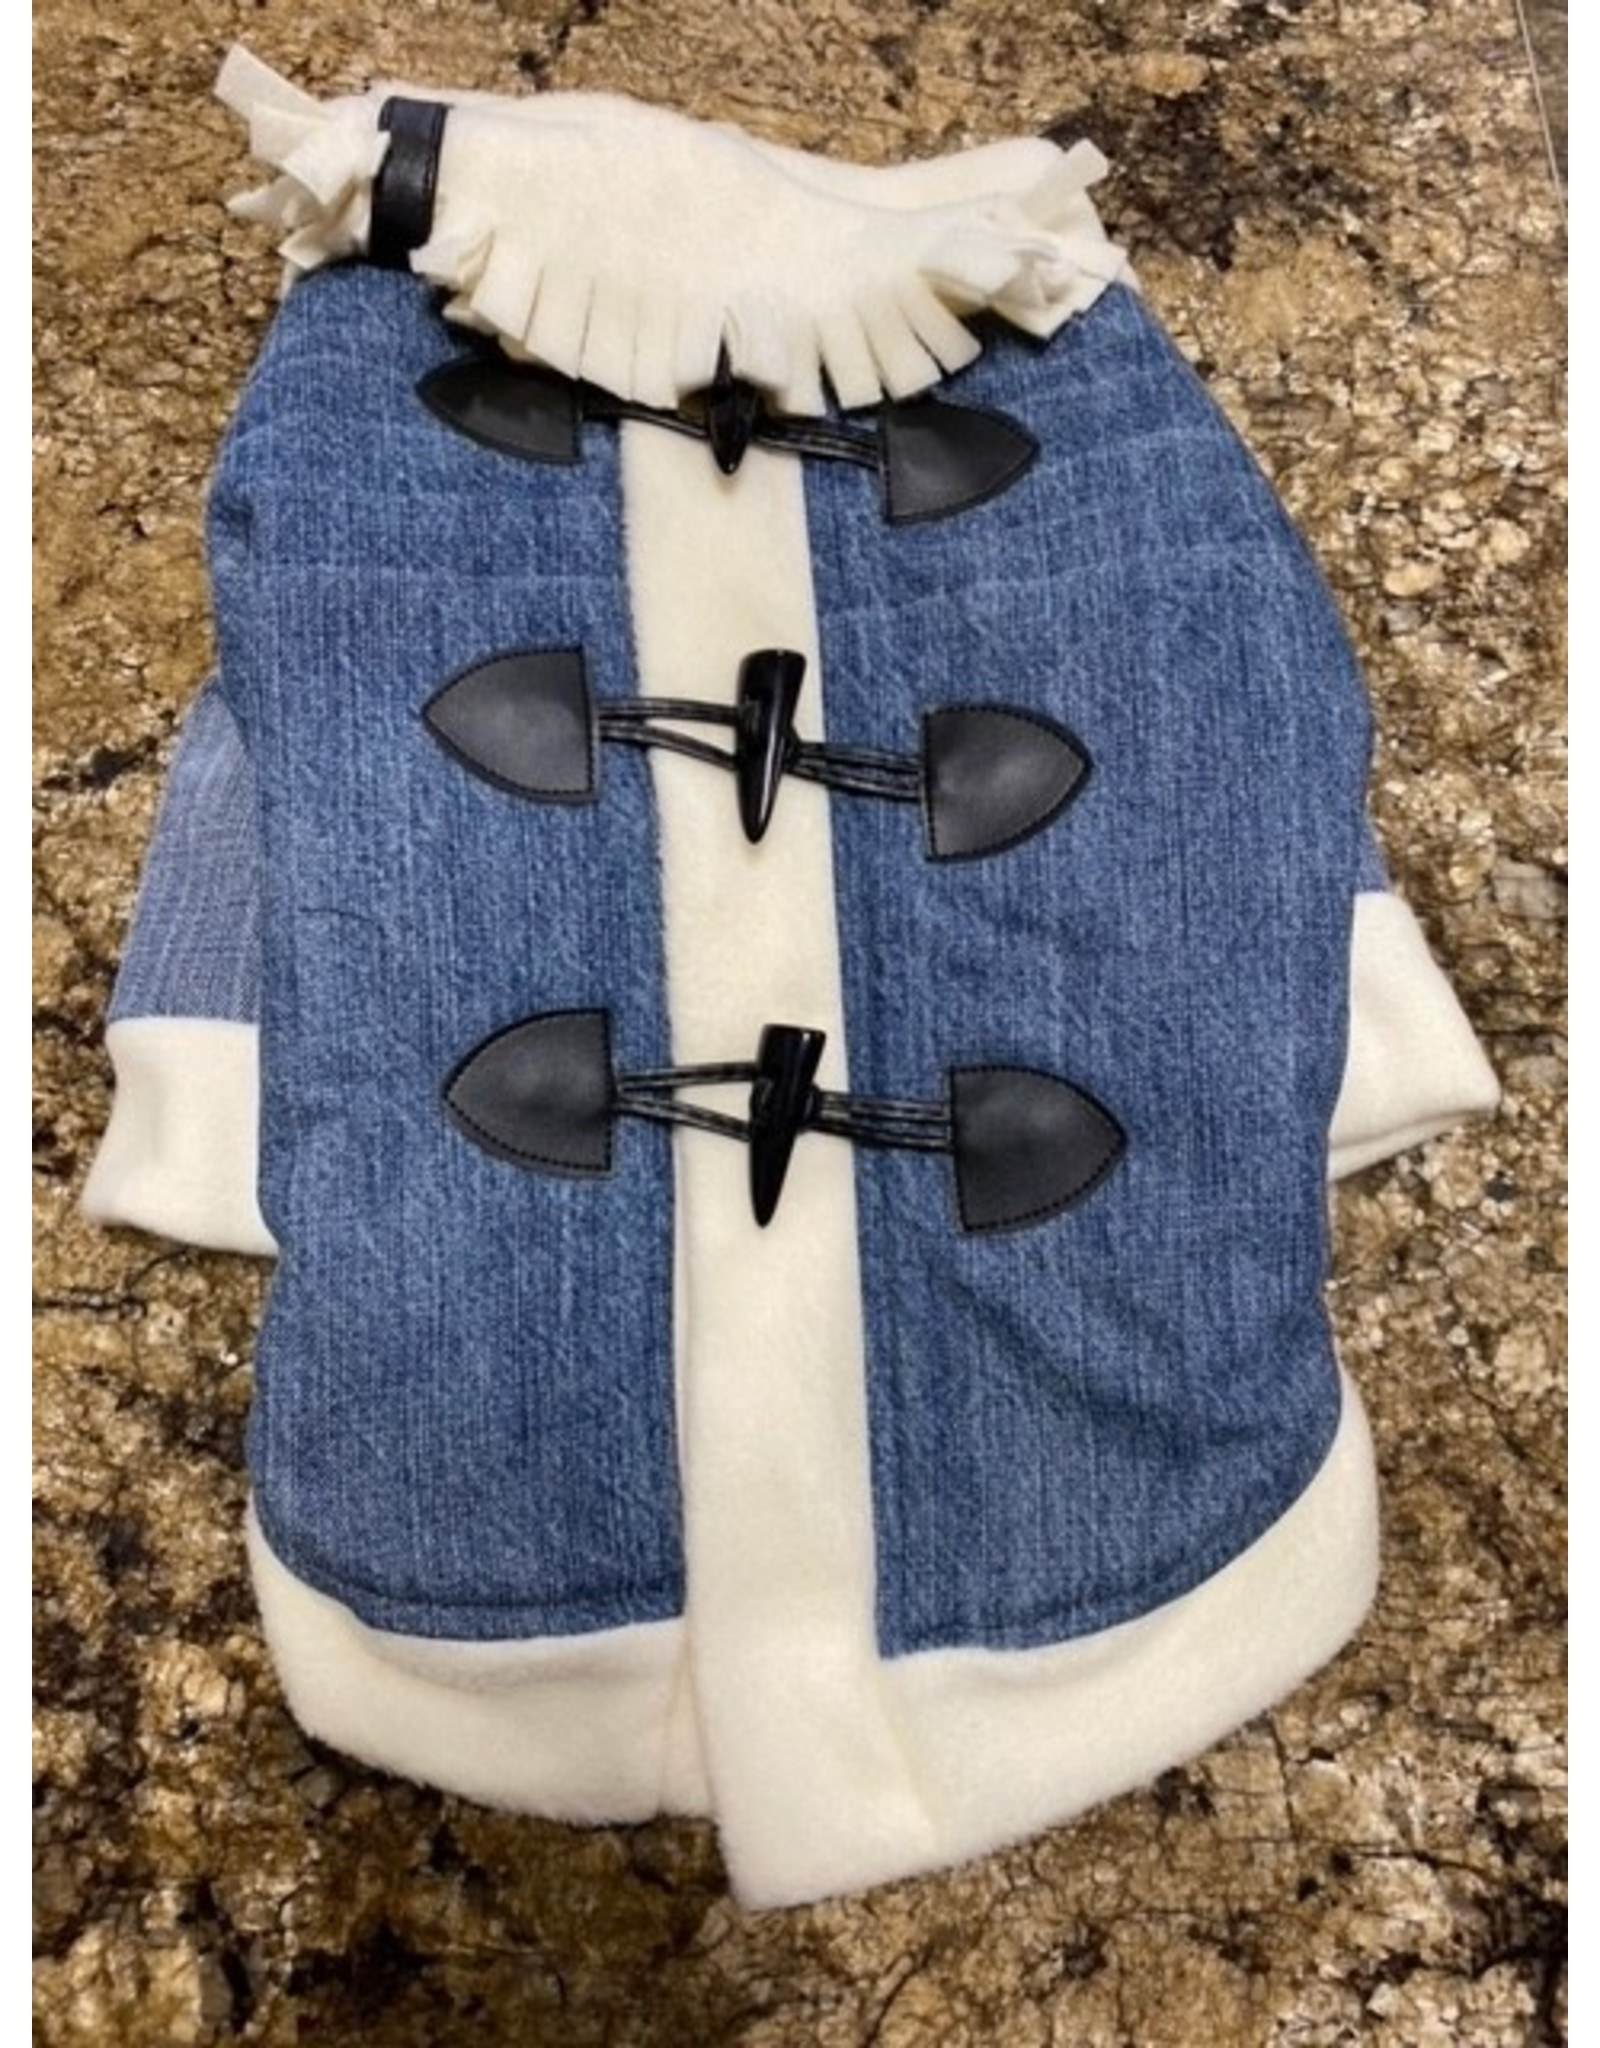 Ruff-Stitched Blue Jean Toggle Coat - Large